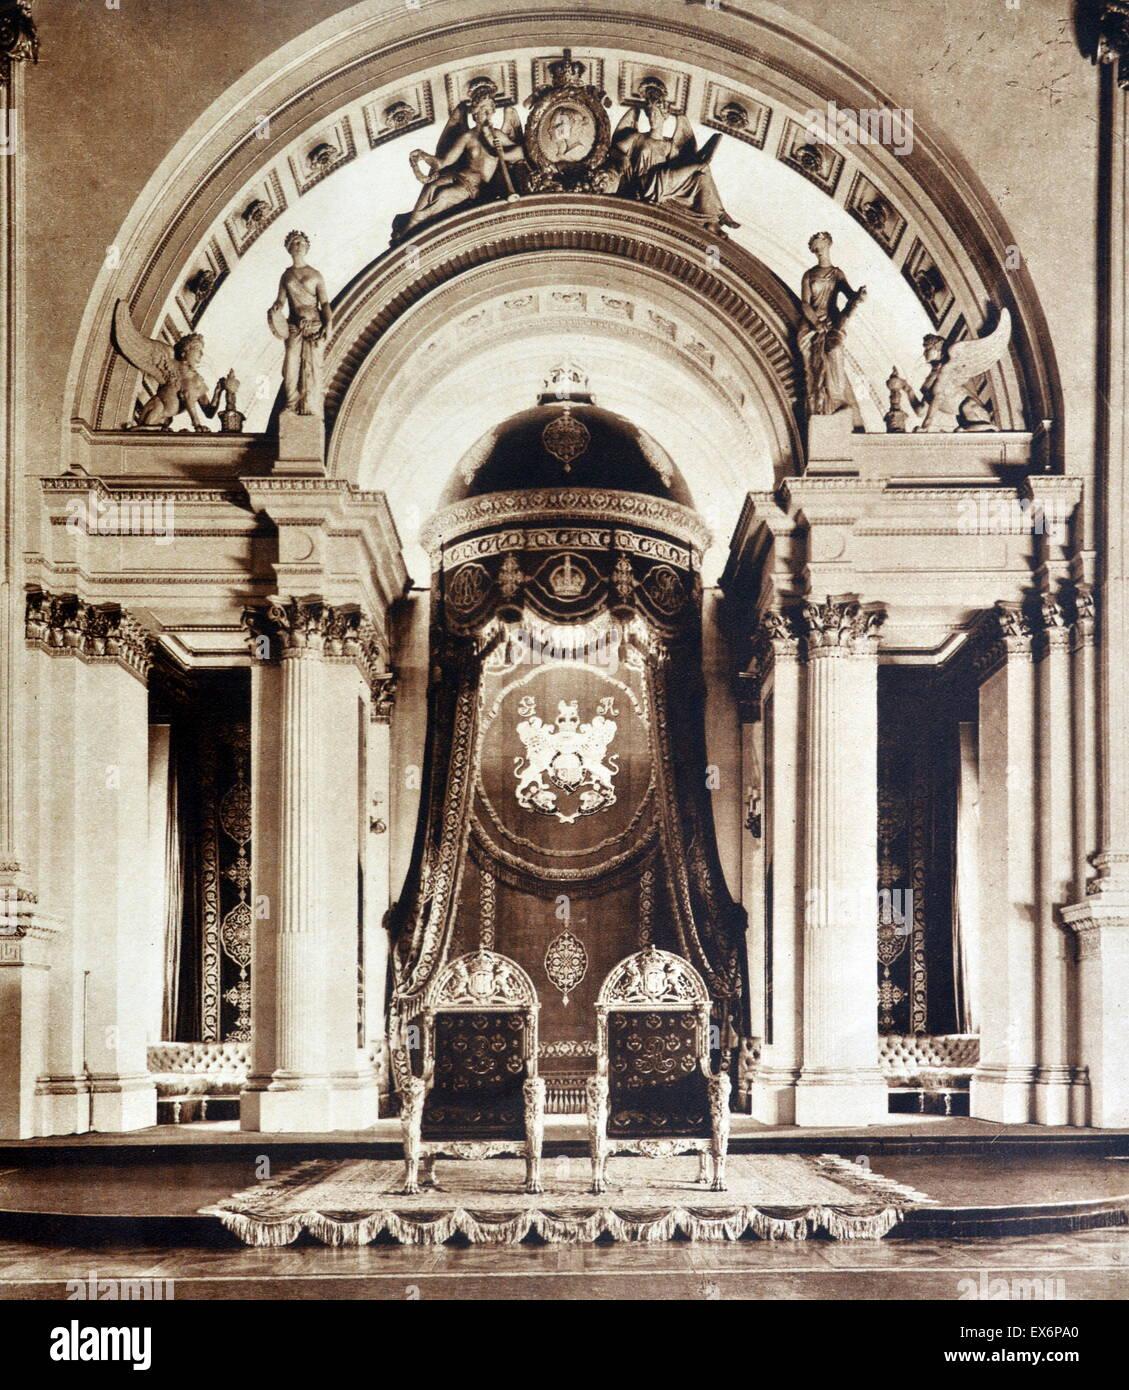 Throne room buckingham palace - Stock Photo Throne Room At Buckingham Palace In London 1935